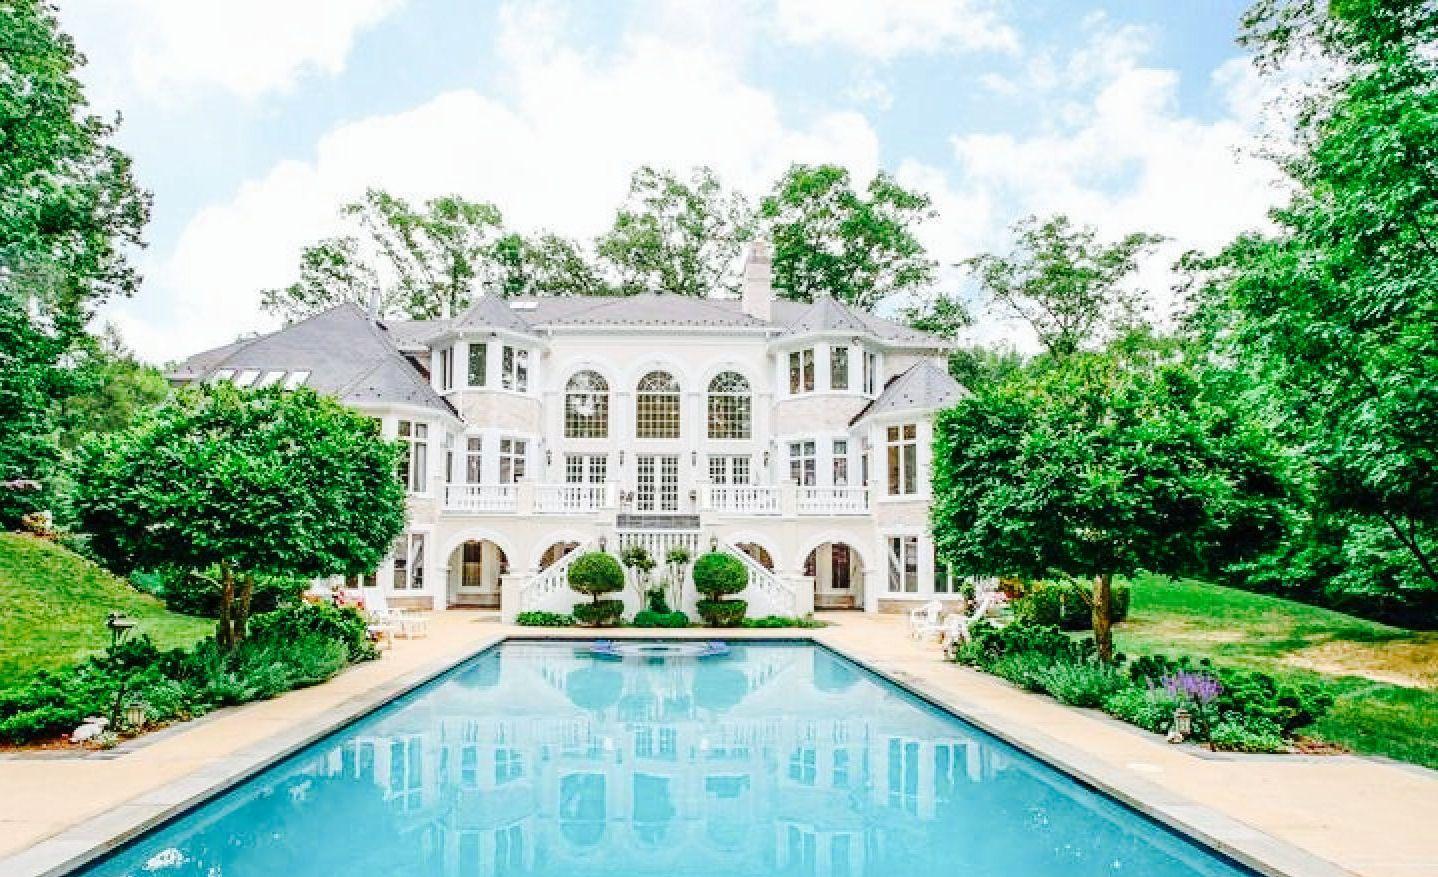 Pretty White House Love The Hugee Pool Big Pretty